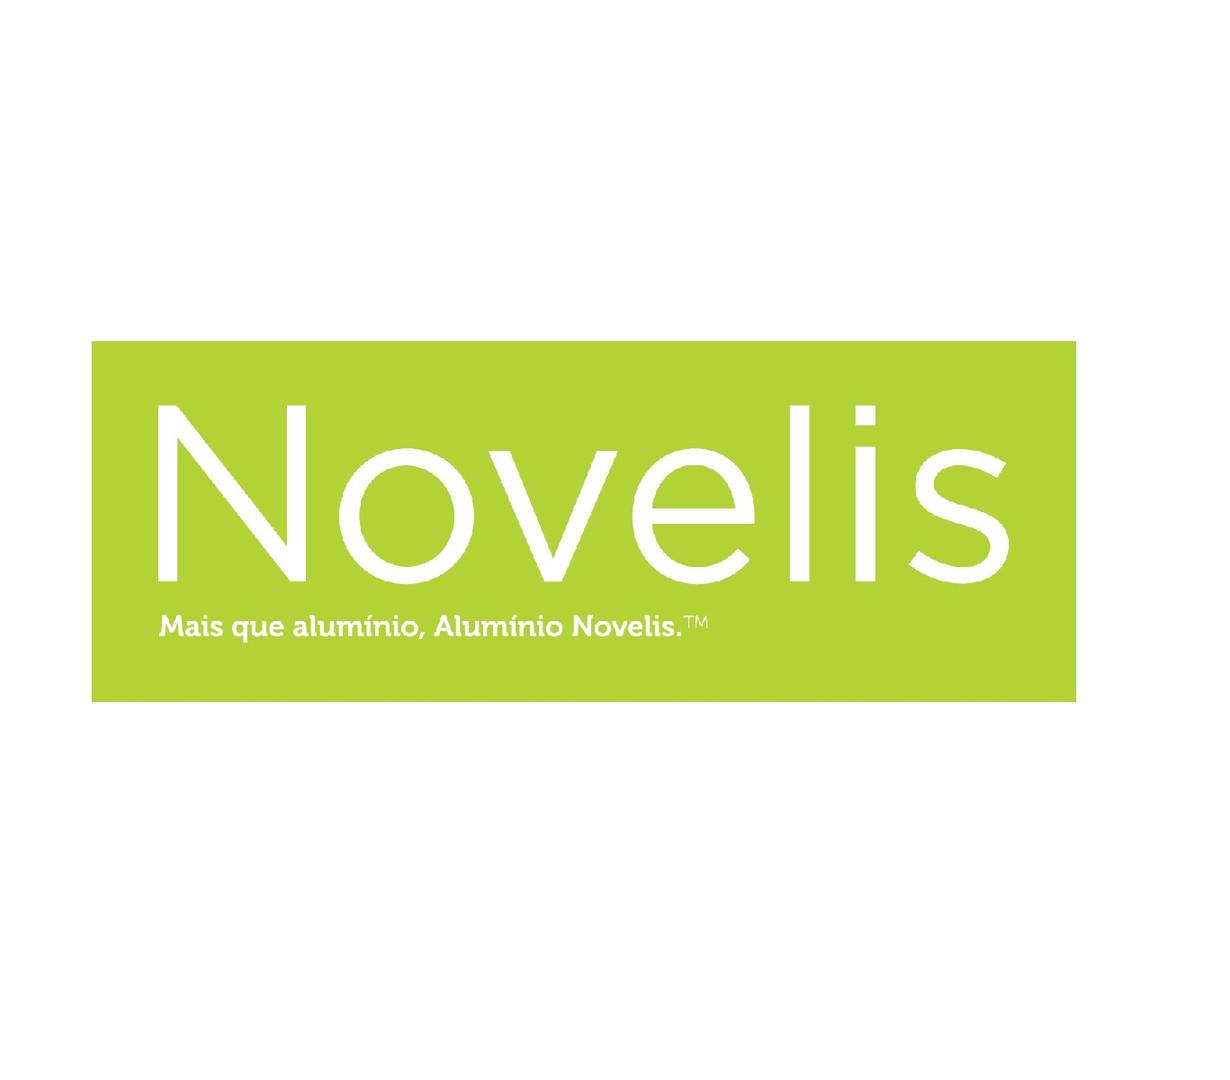 NOvelis reduzido logo.jpg